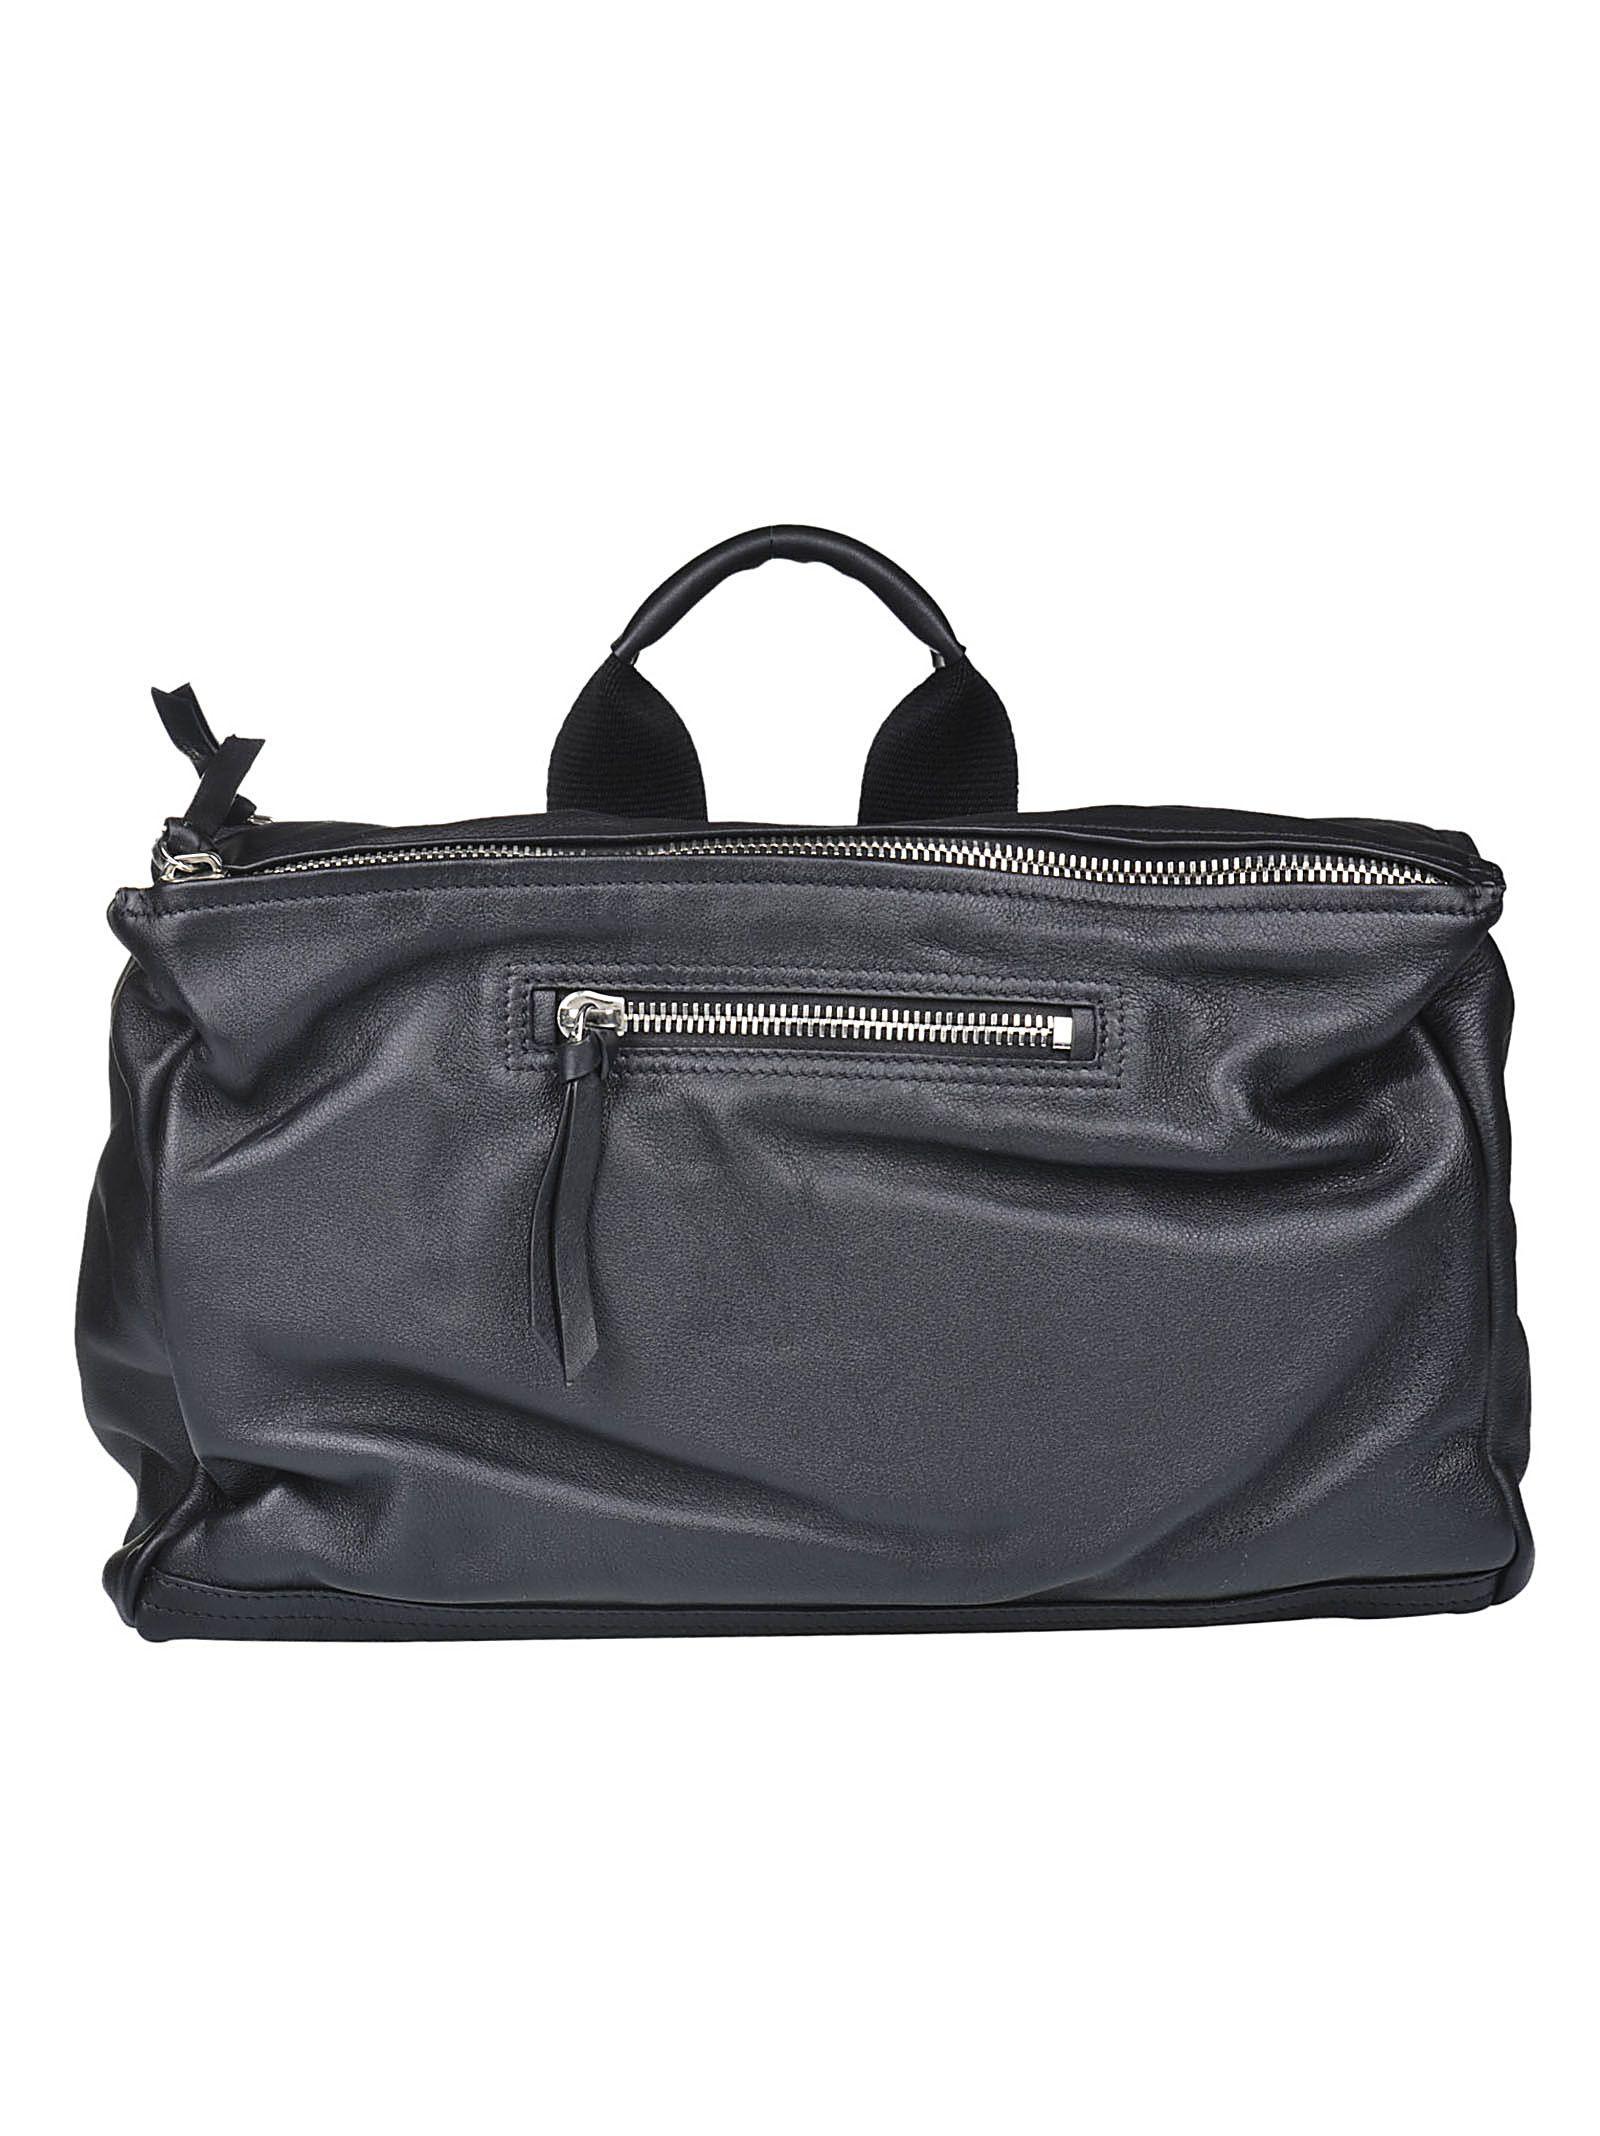 e799ef5ba2 Givenchy Givenchy Blurred Stars Pandora Messenger Holdall - Black ...